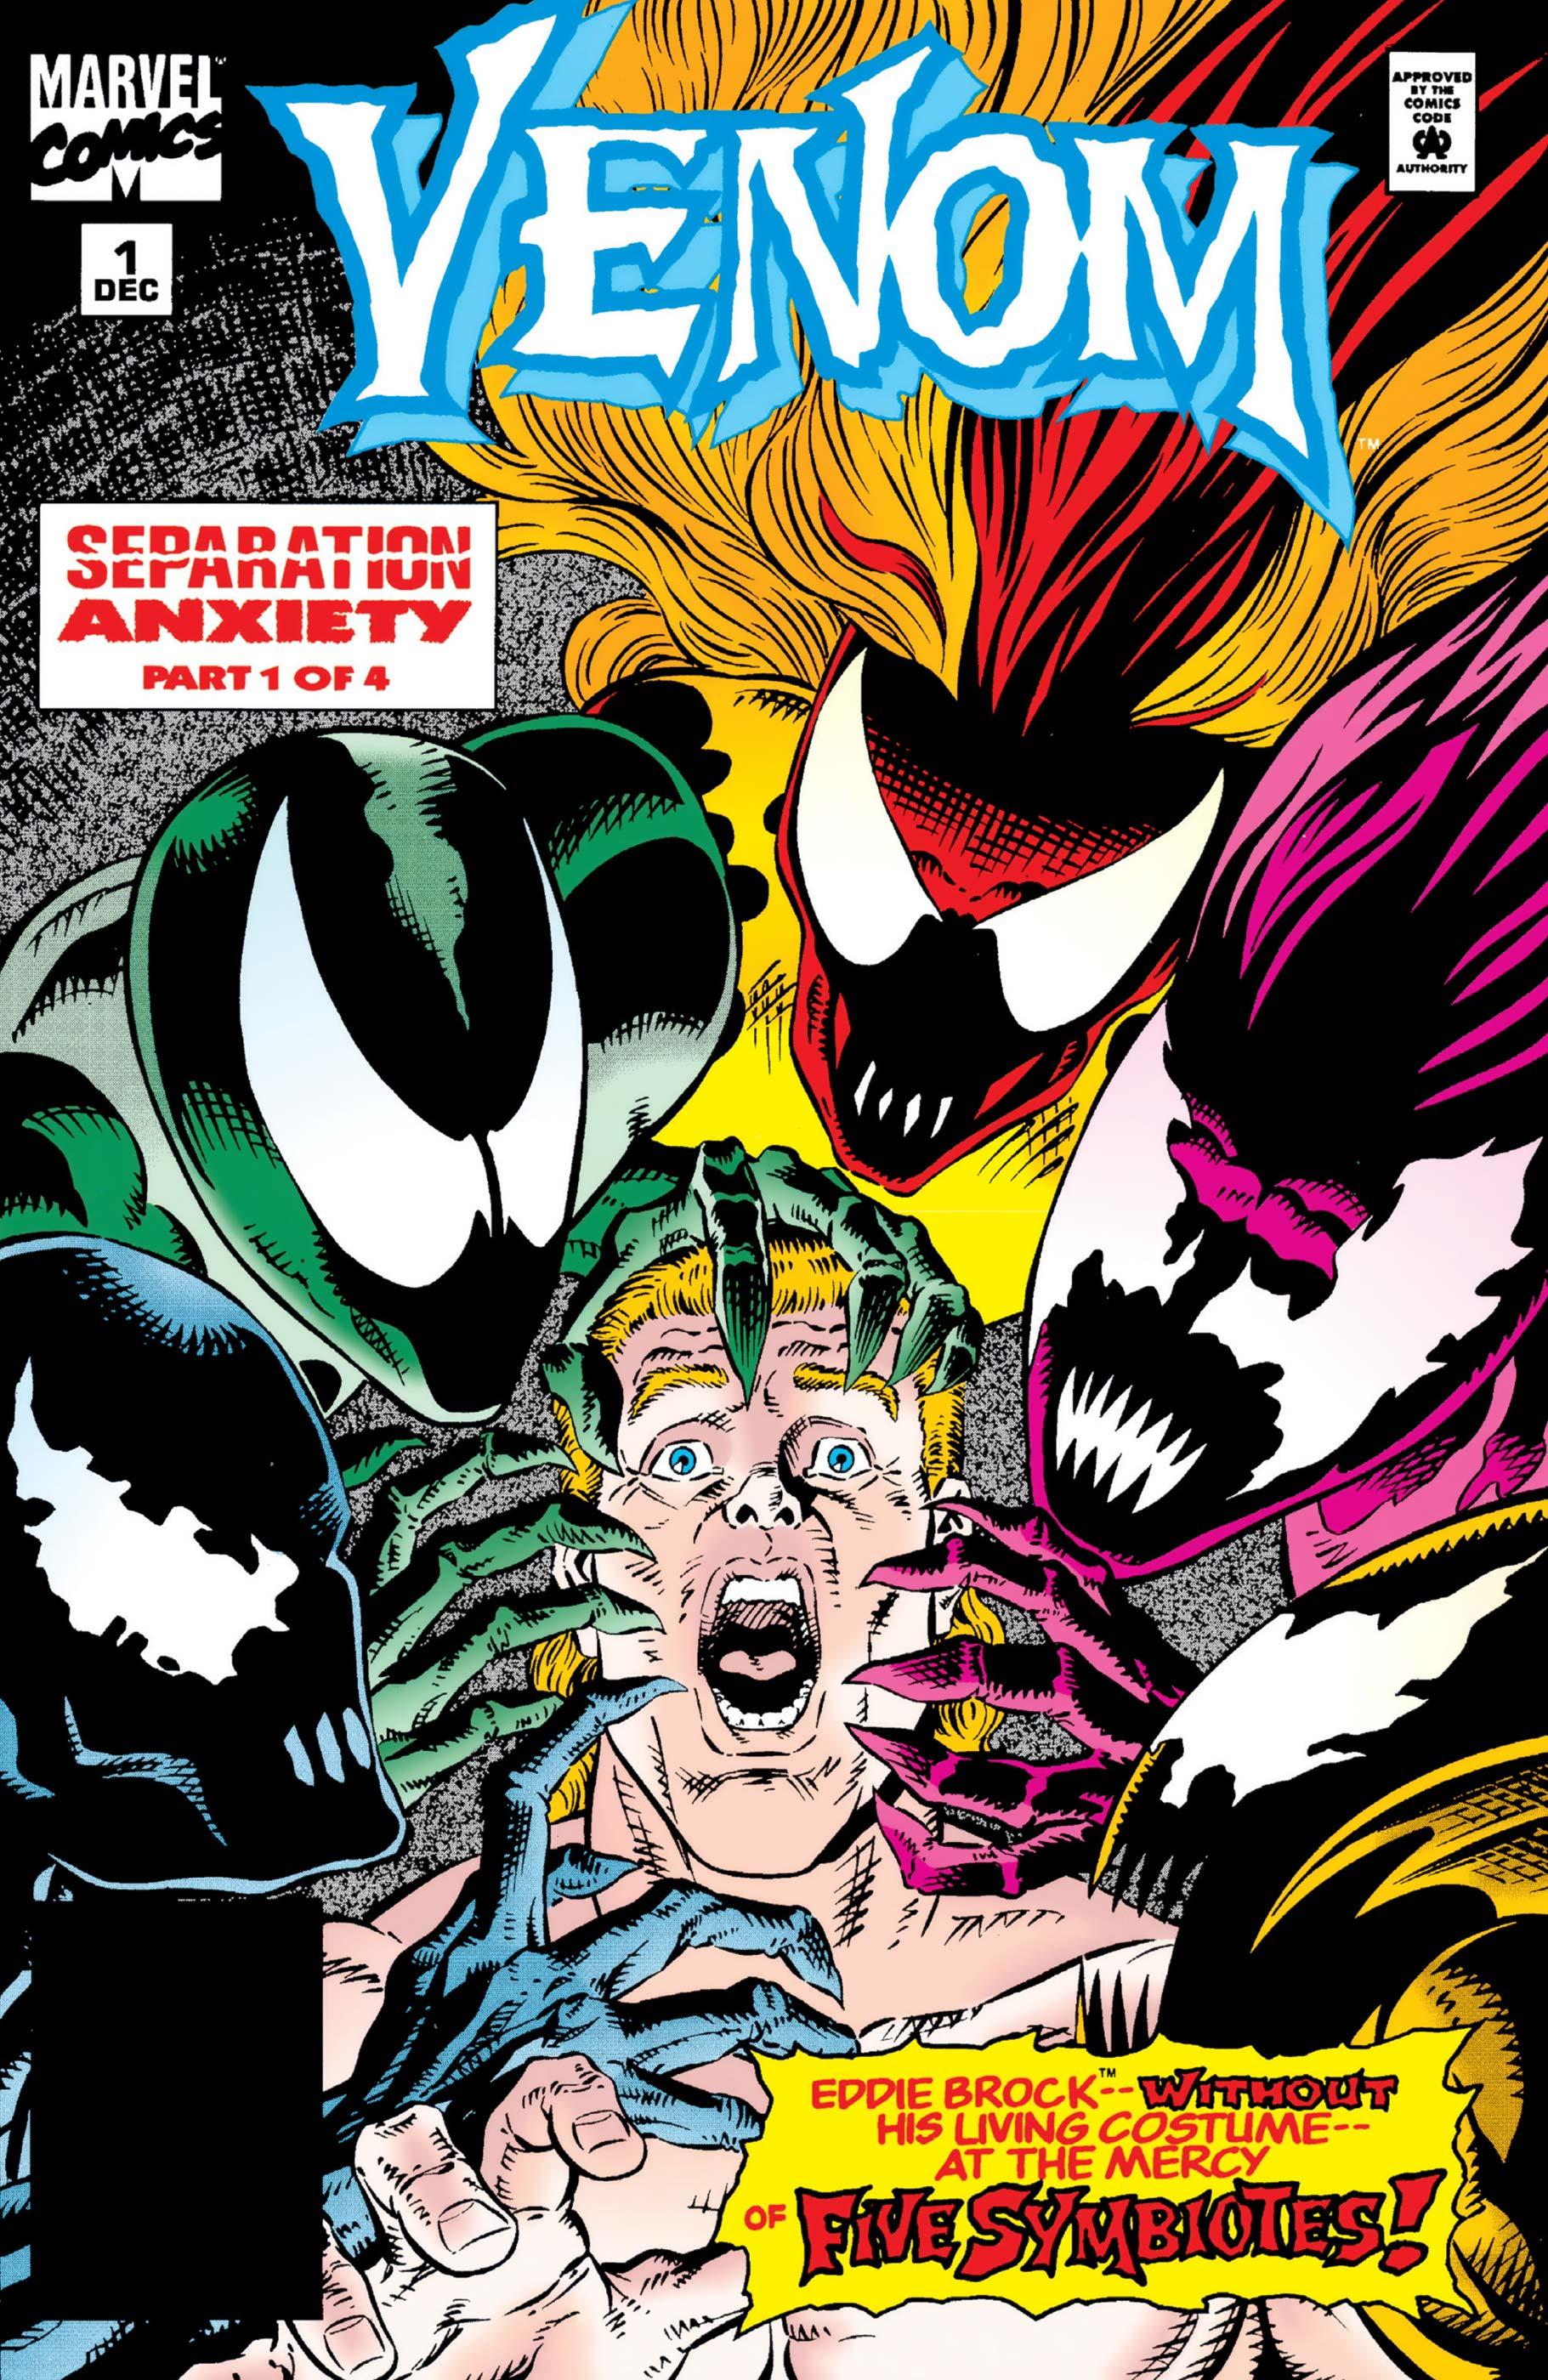 Venom: Separation Anxiety (1994) #1